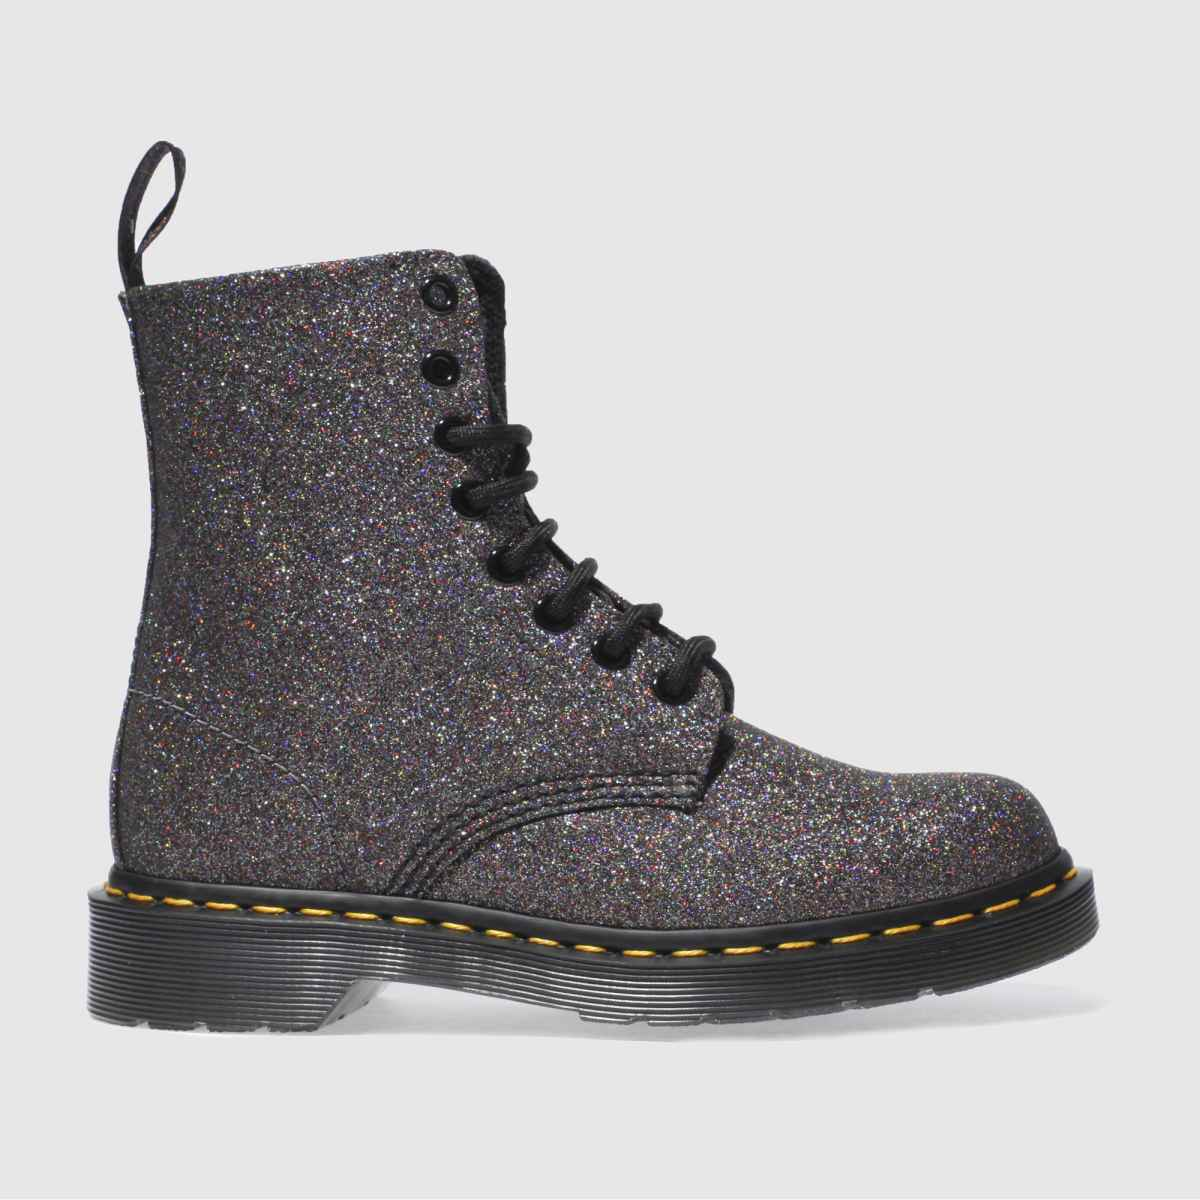 dr martens black & purple pascal 8 eye boot glitter boots